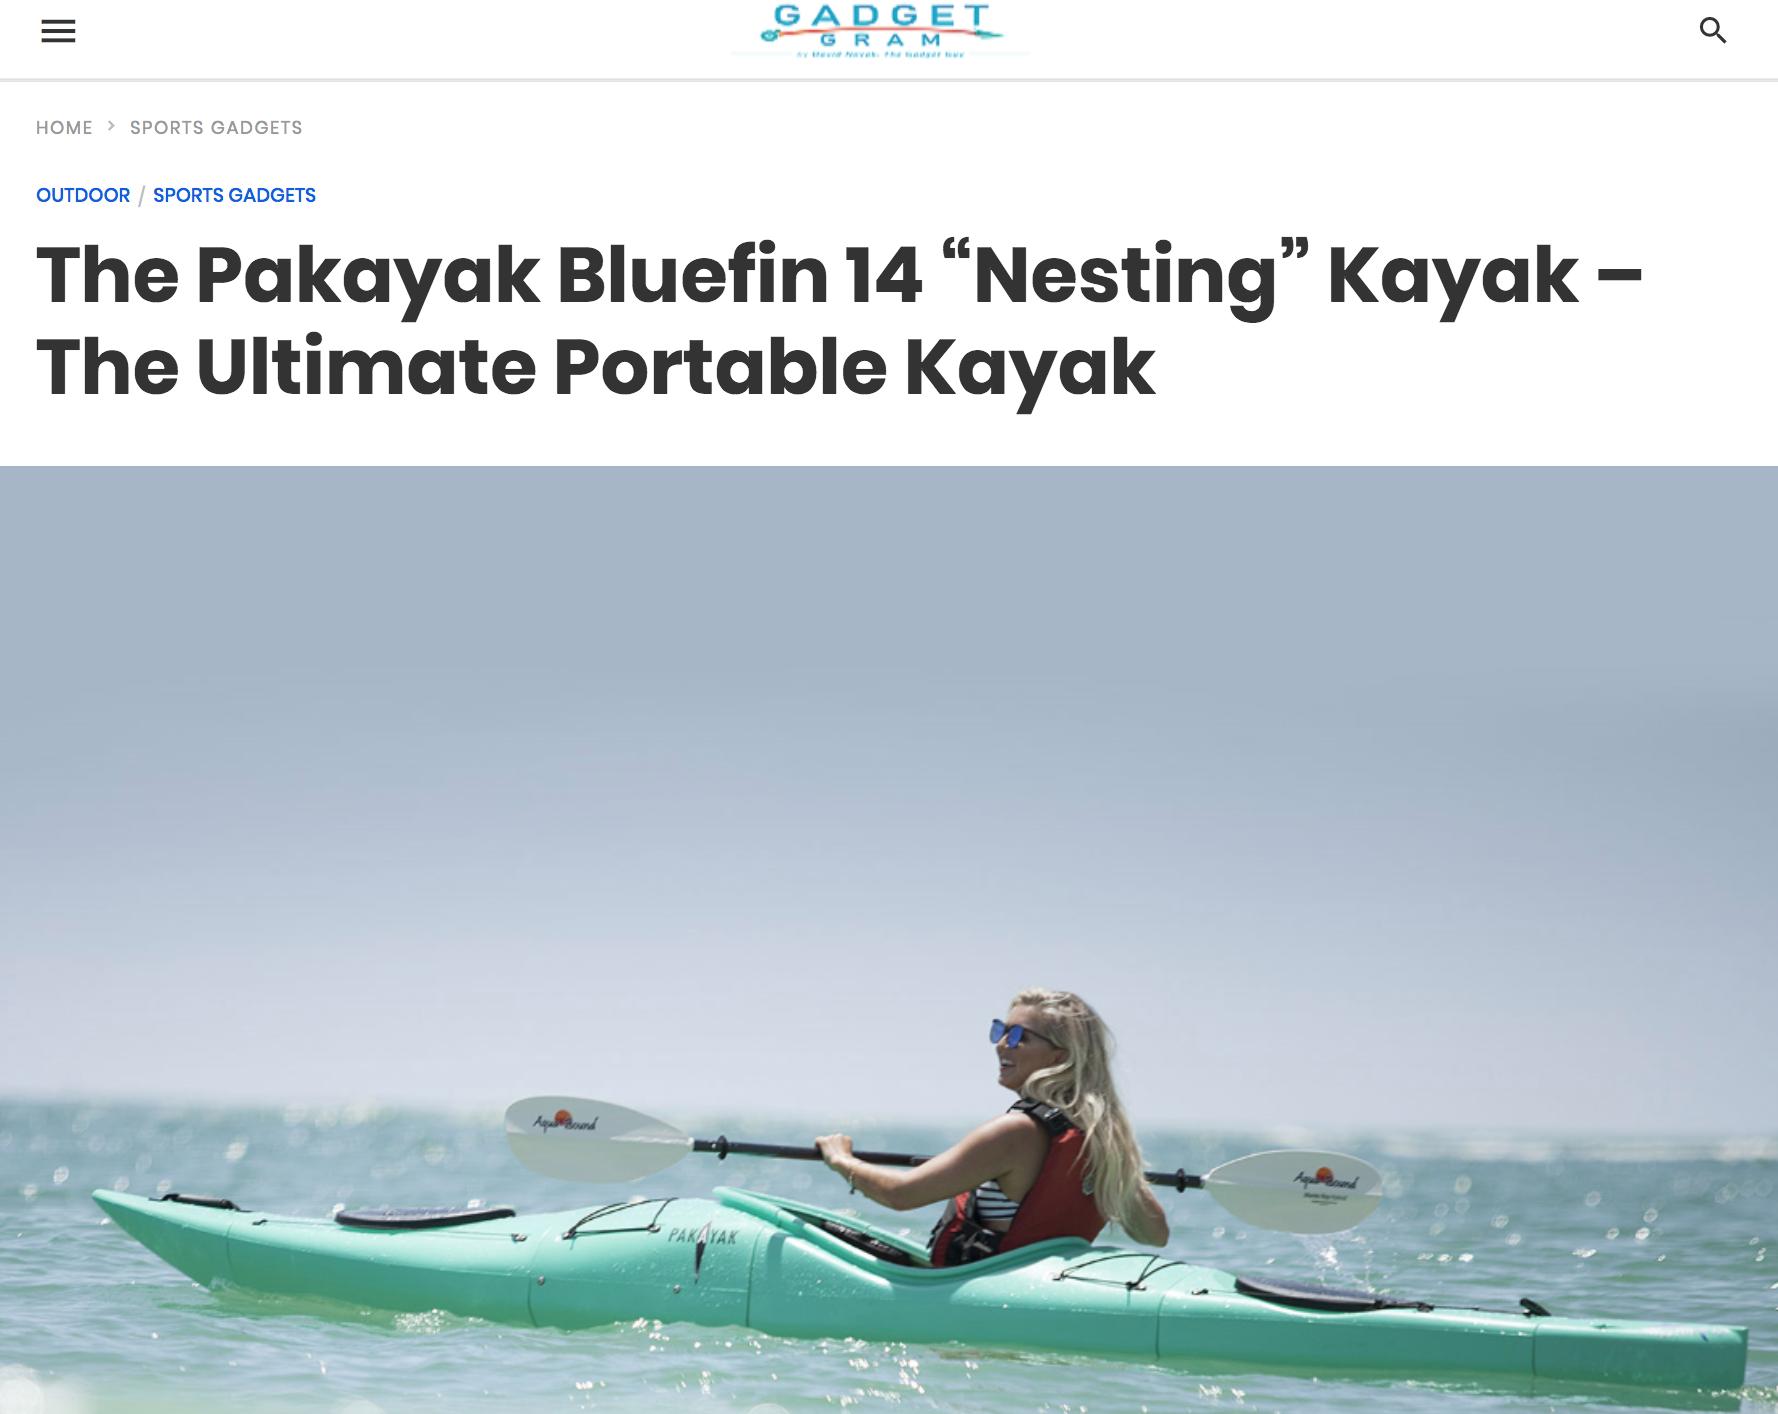 "GadgetGram: The Pakayak Bluefin 14 ""Nesting"" Kayak – The Ultimate Portable Kayak"